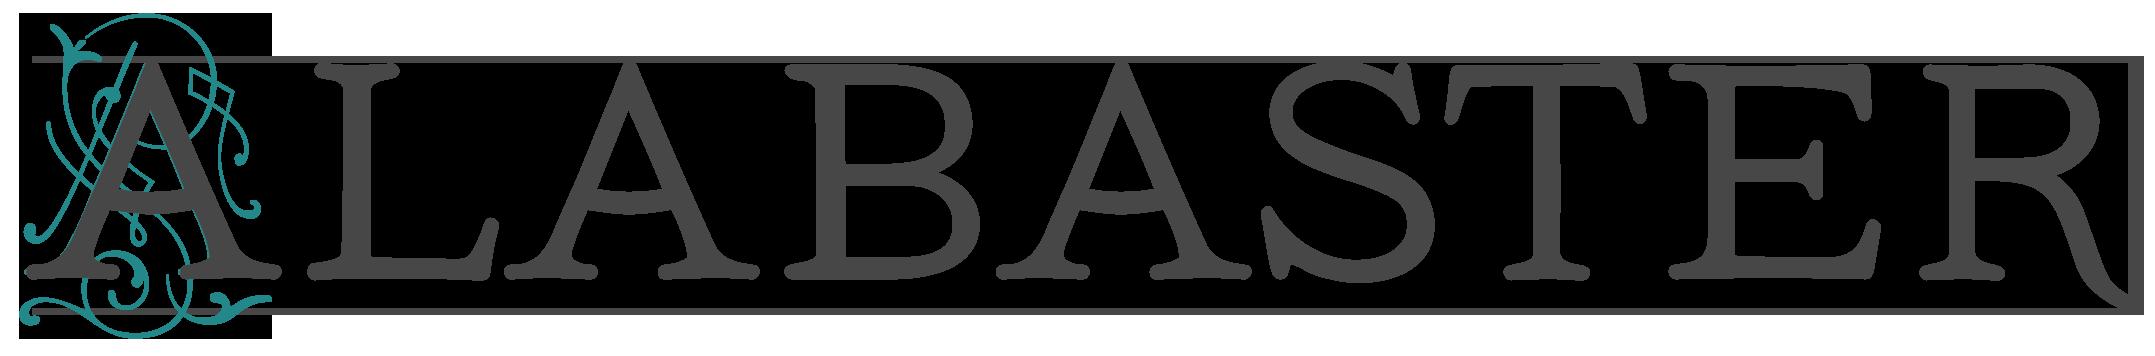 alabaster-text.png